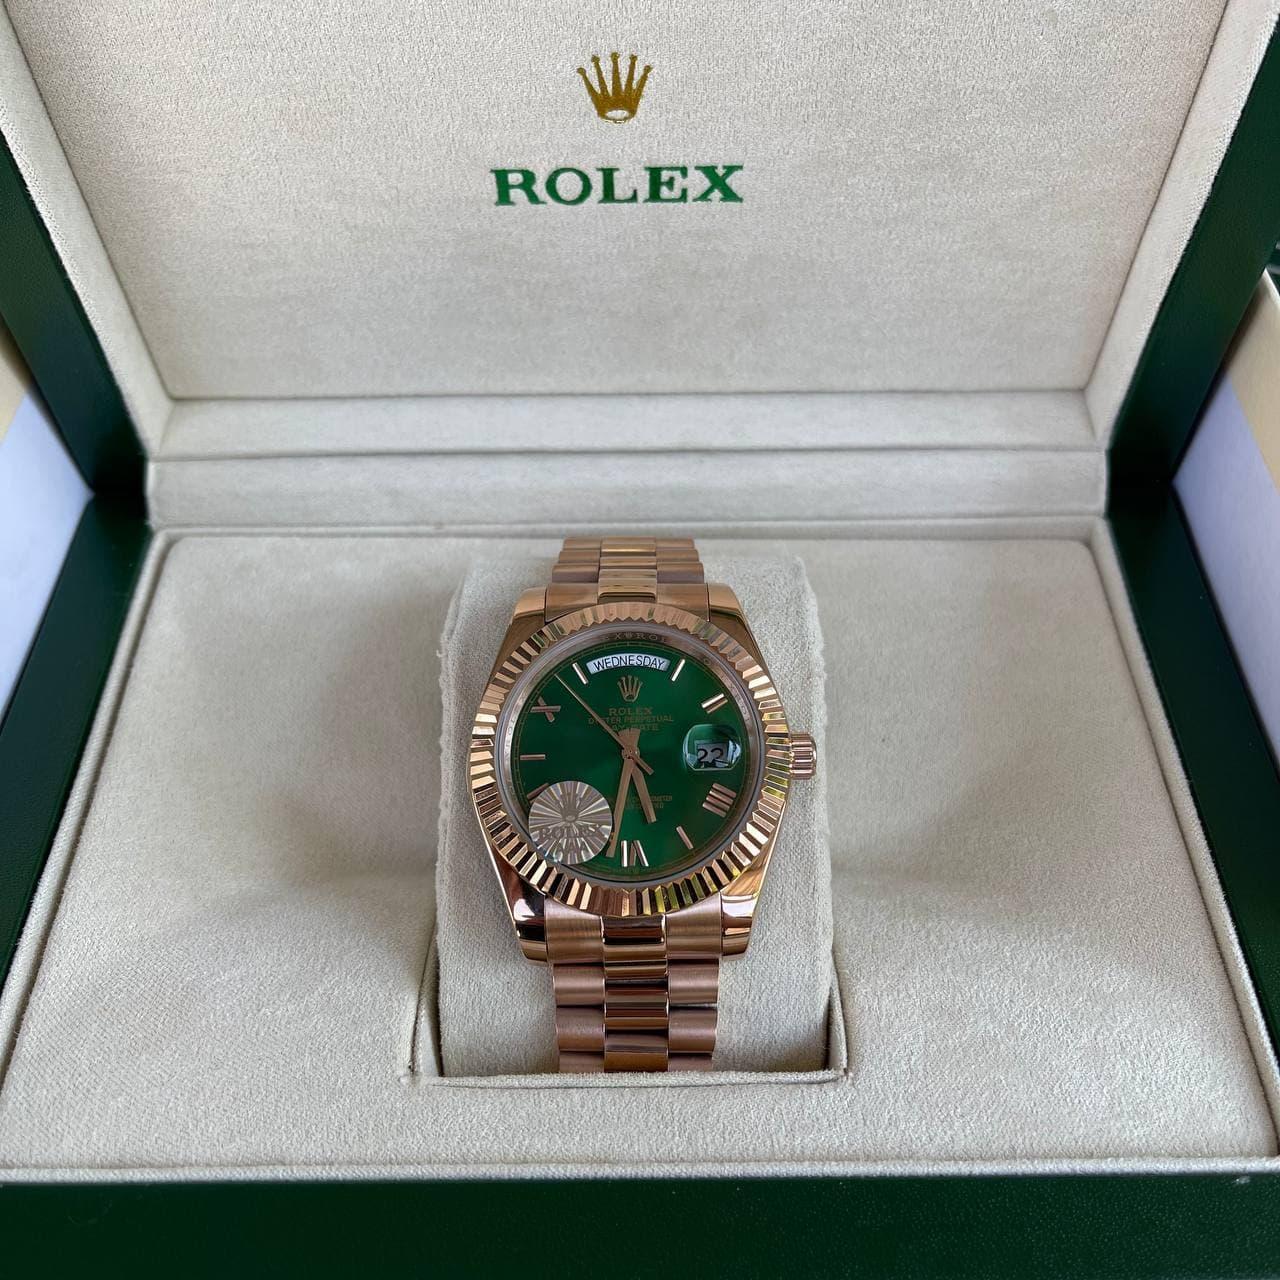 Часы Rolex Oyster Perpetual Gold-Green премиального ААА класса